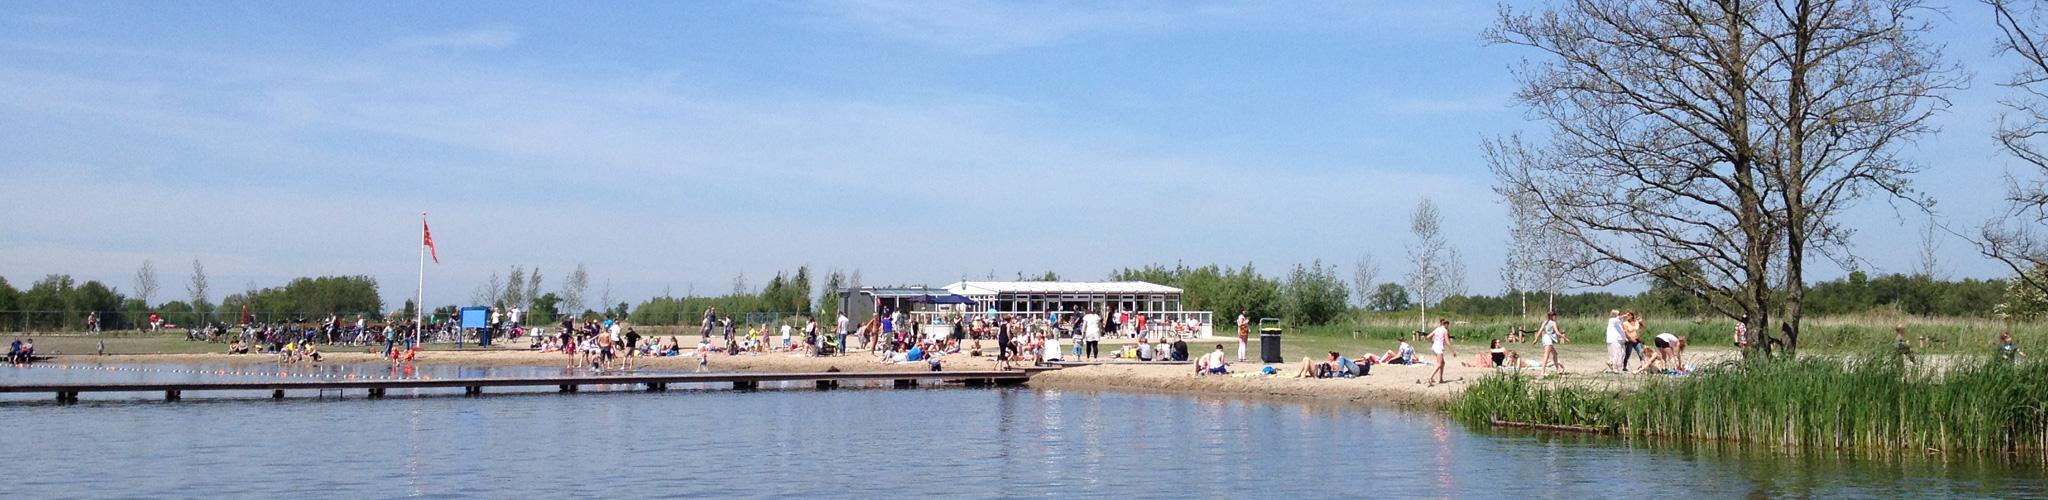 Strand Zomer Nieuwkoop